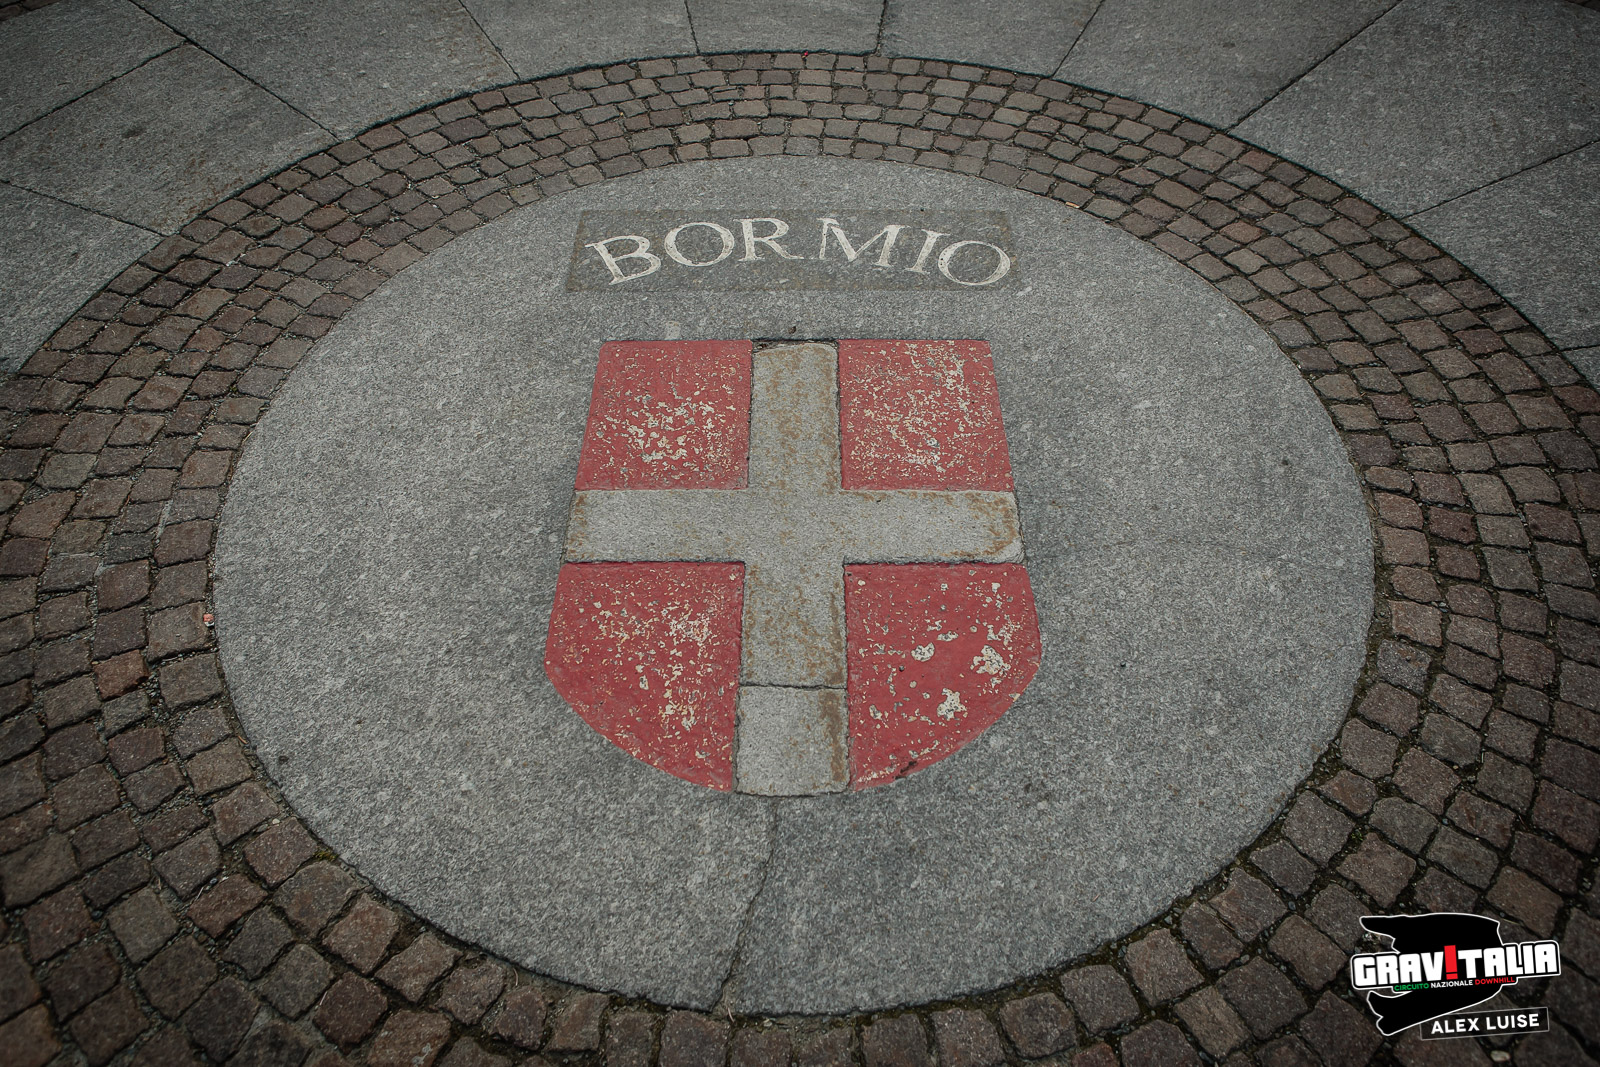 rd3_bormio_2016_001